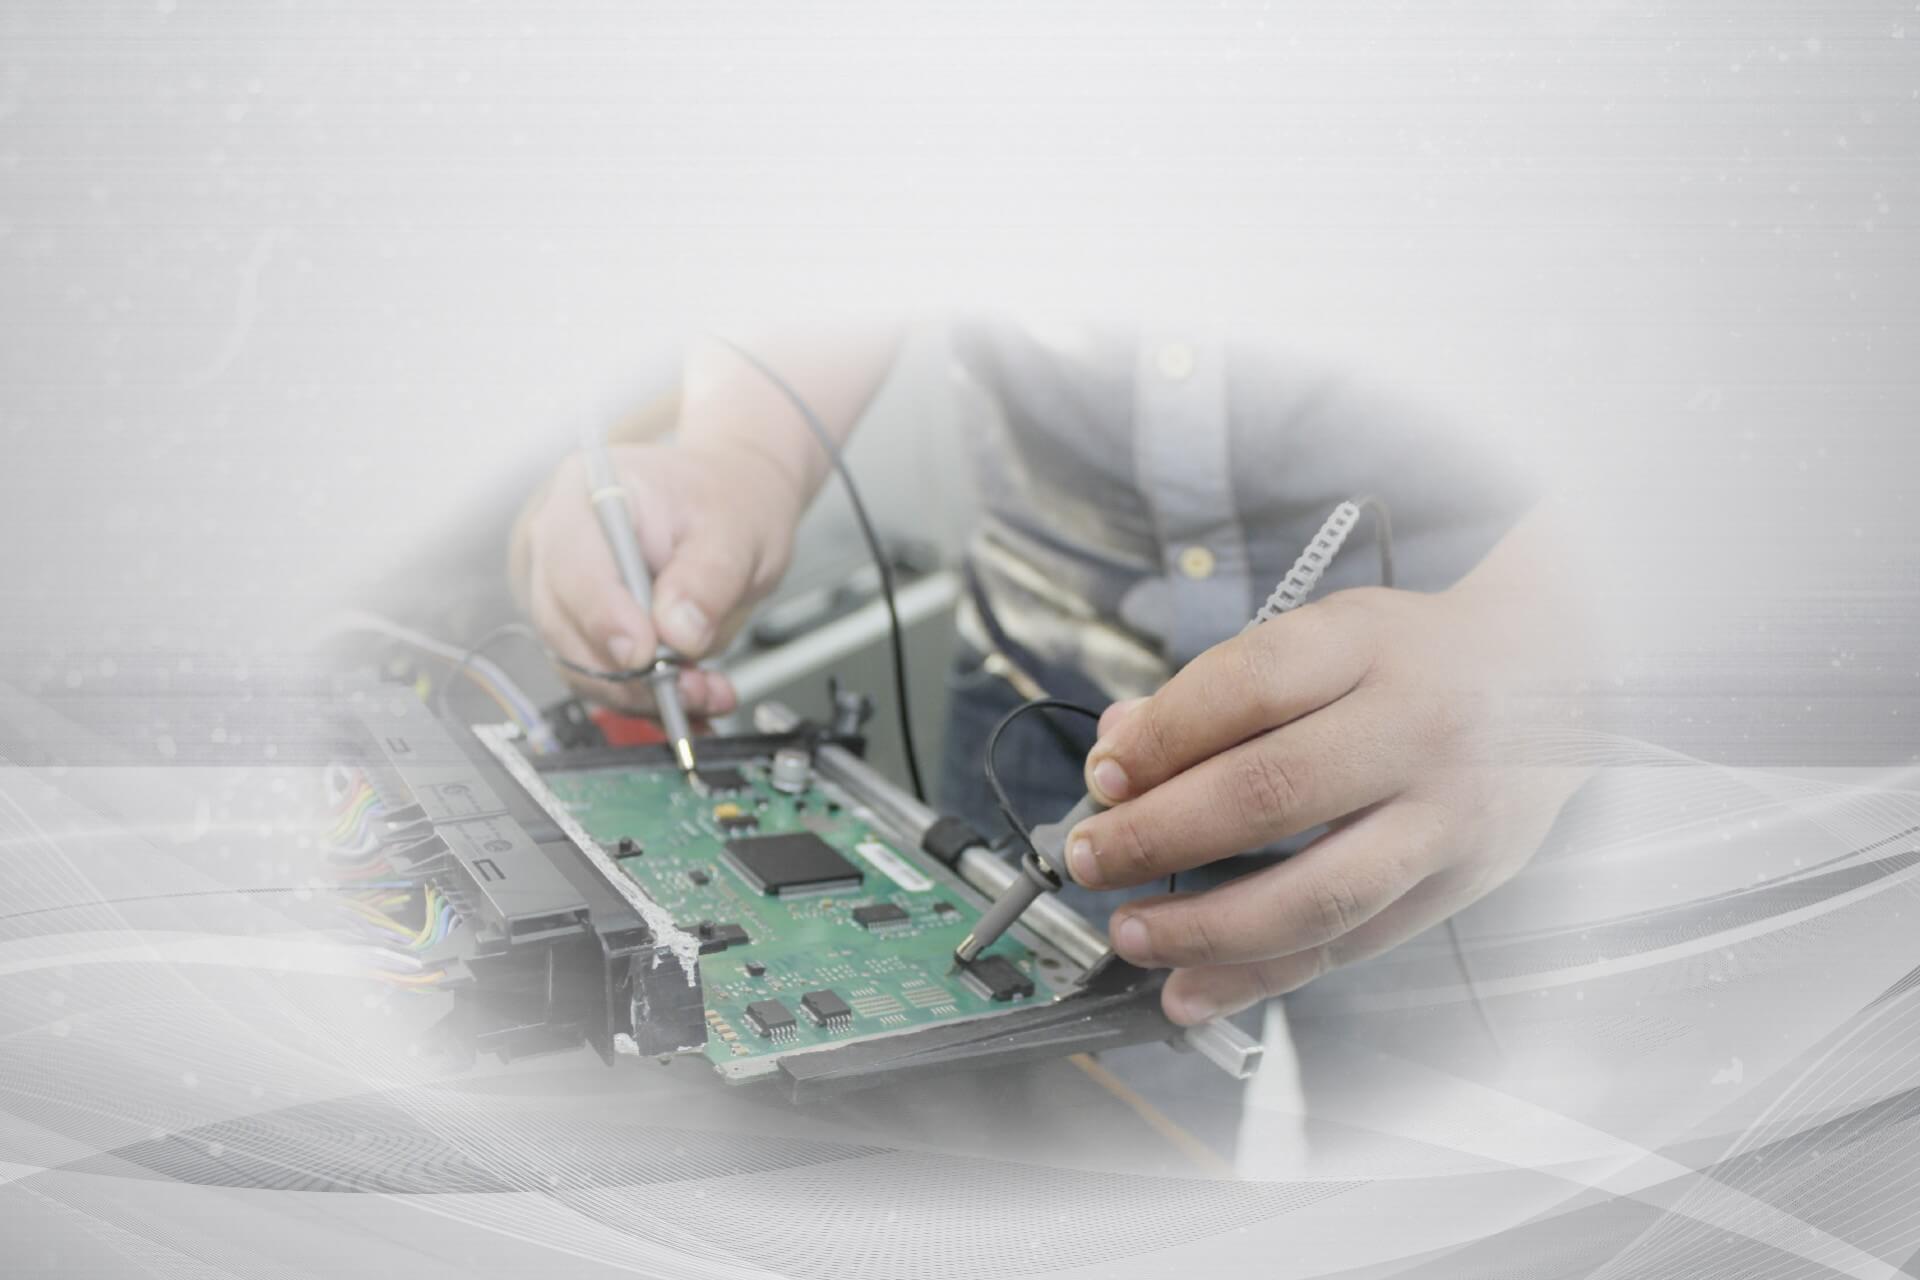 training-of-repairs-in-light-lines-modules